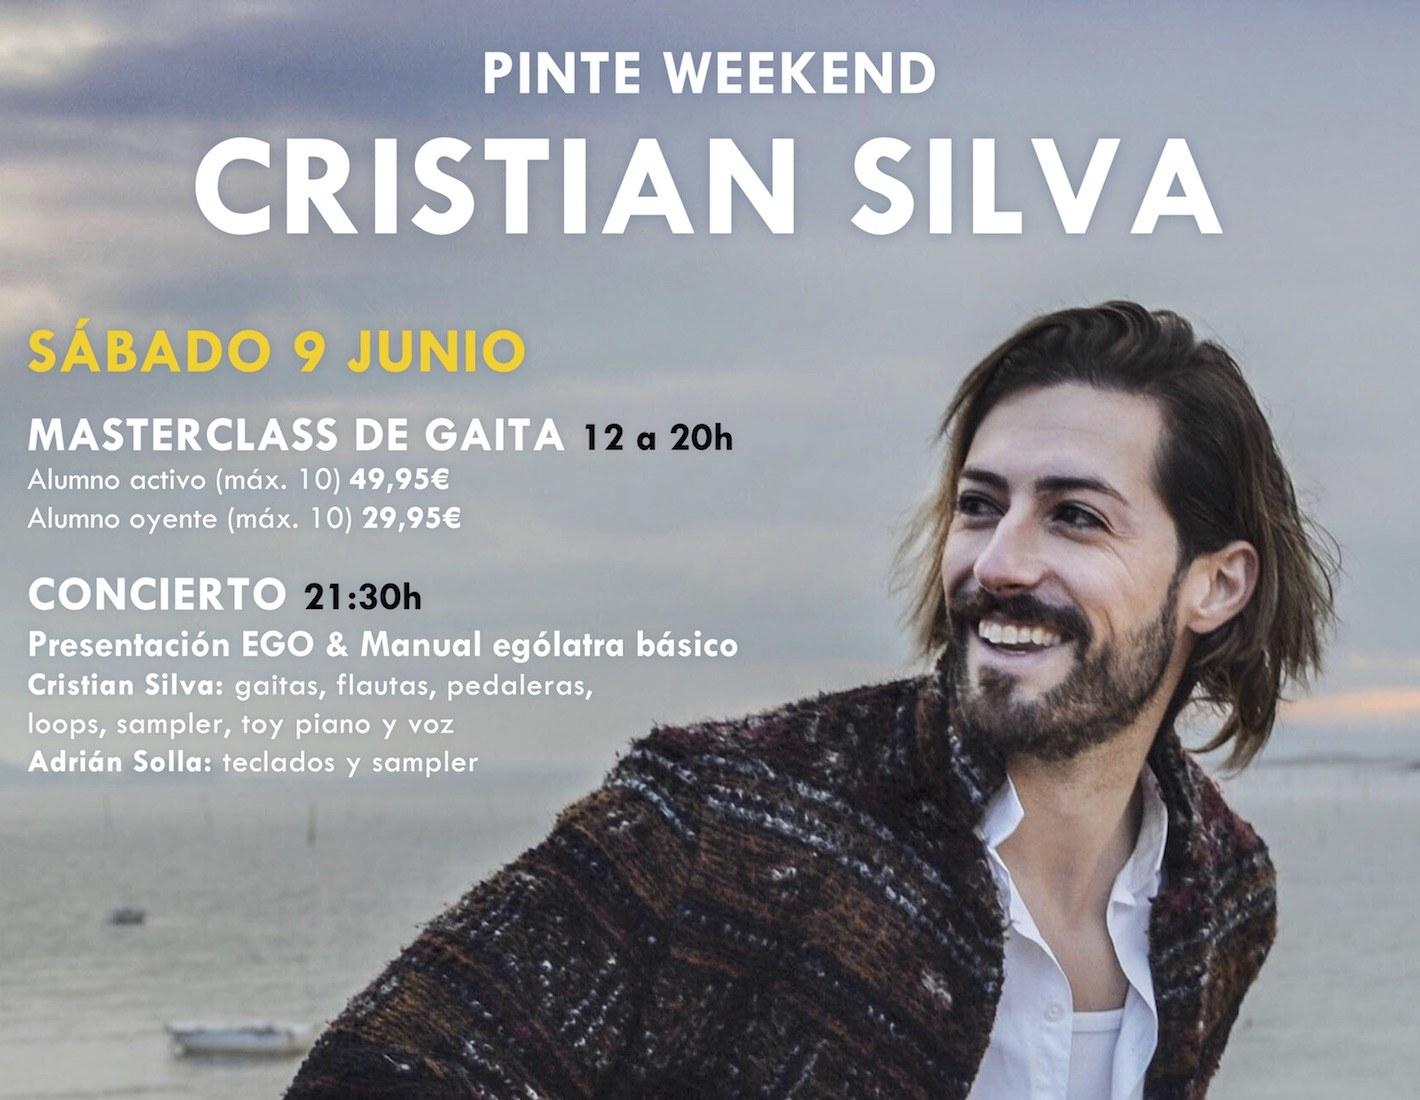 PinteWeekend concierto de Cristian Silva en Madrid Masterclass